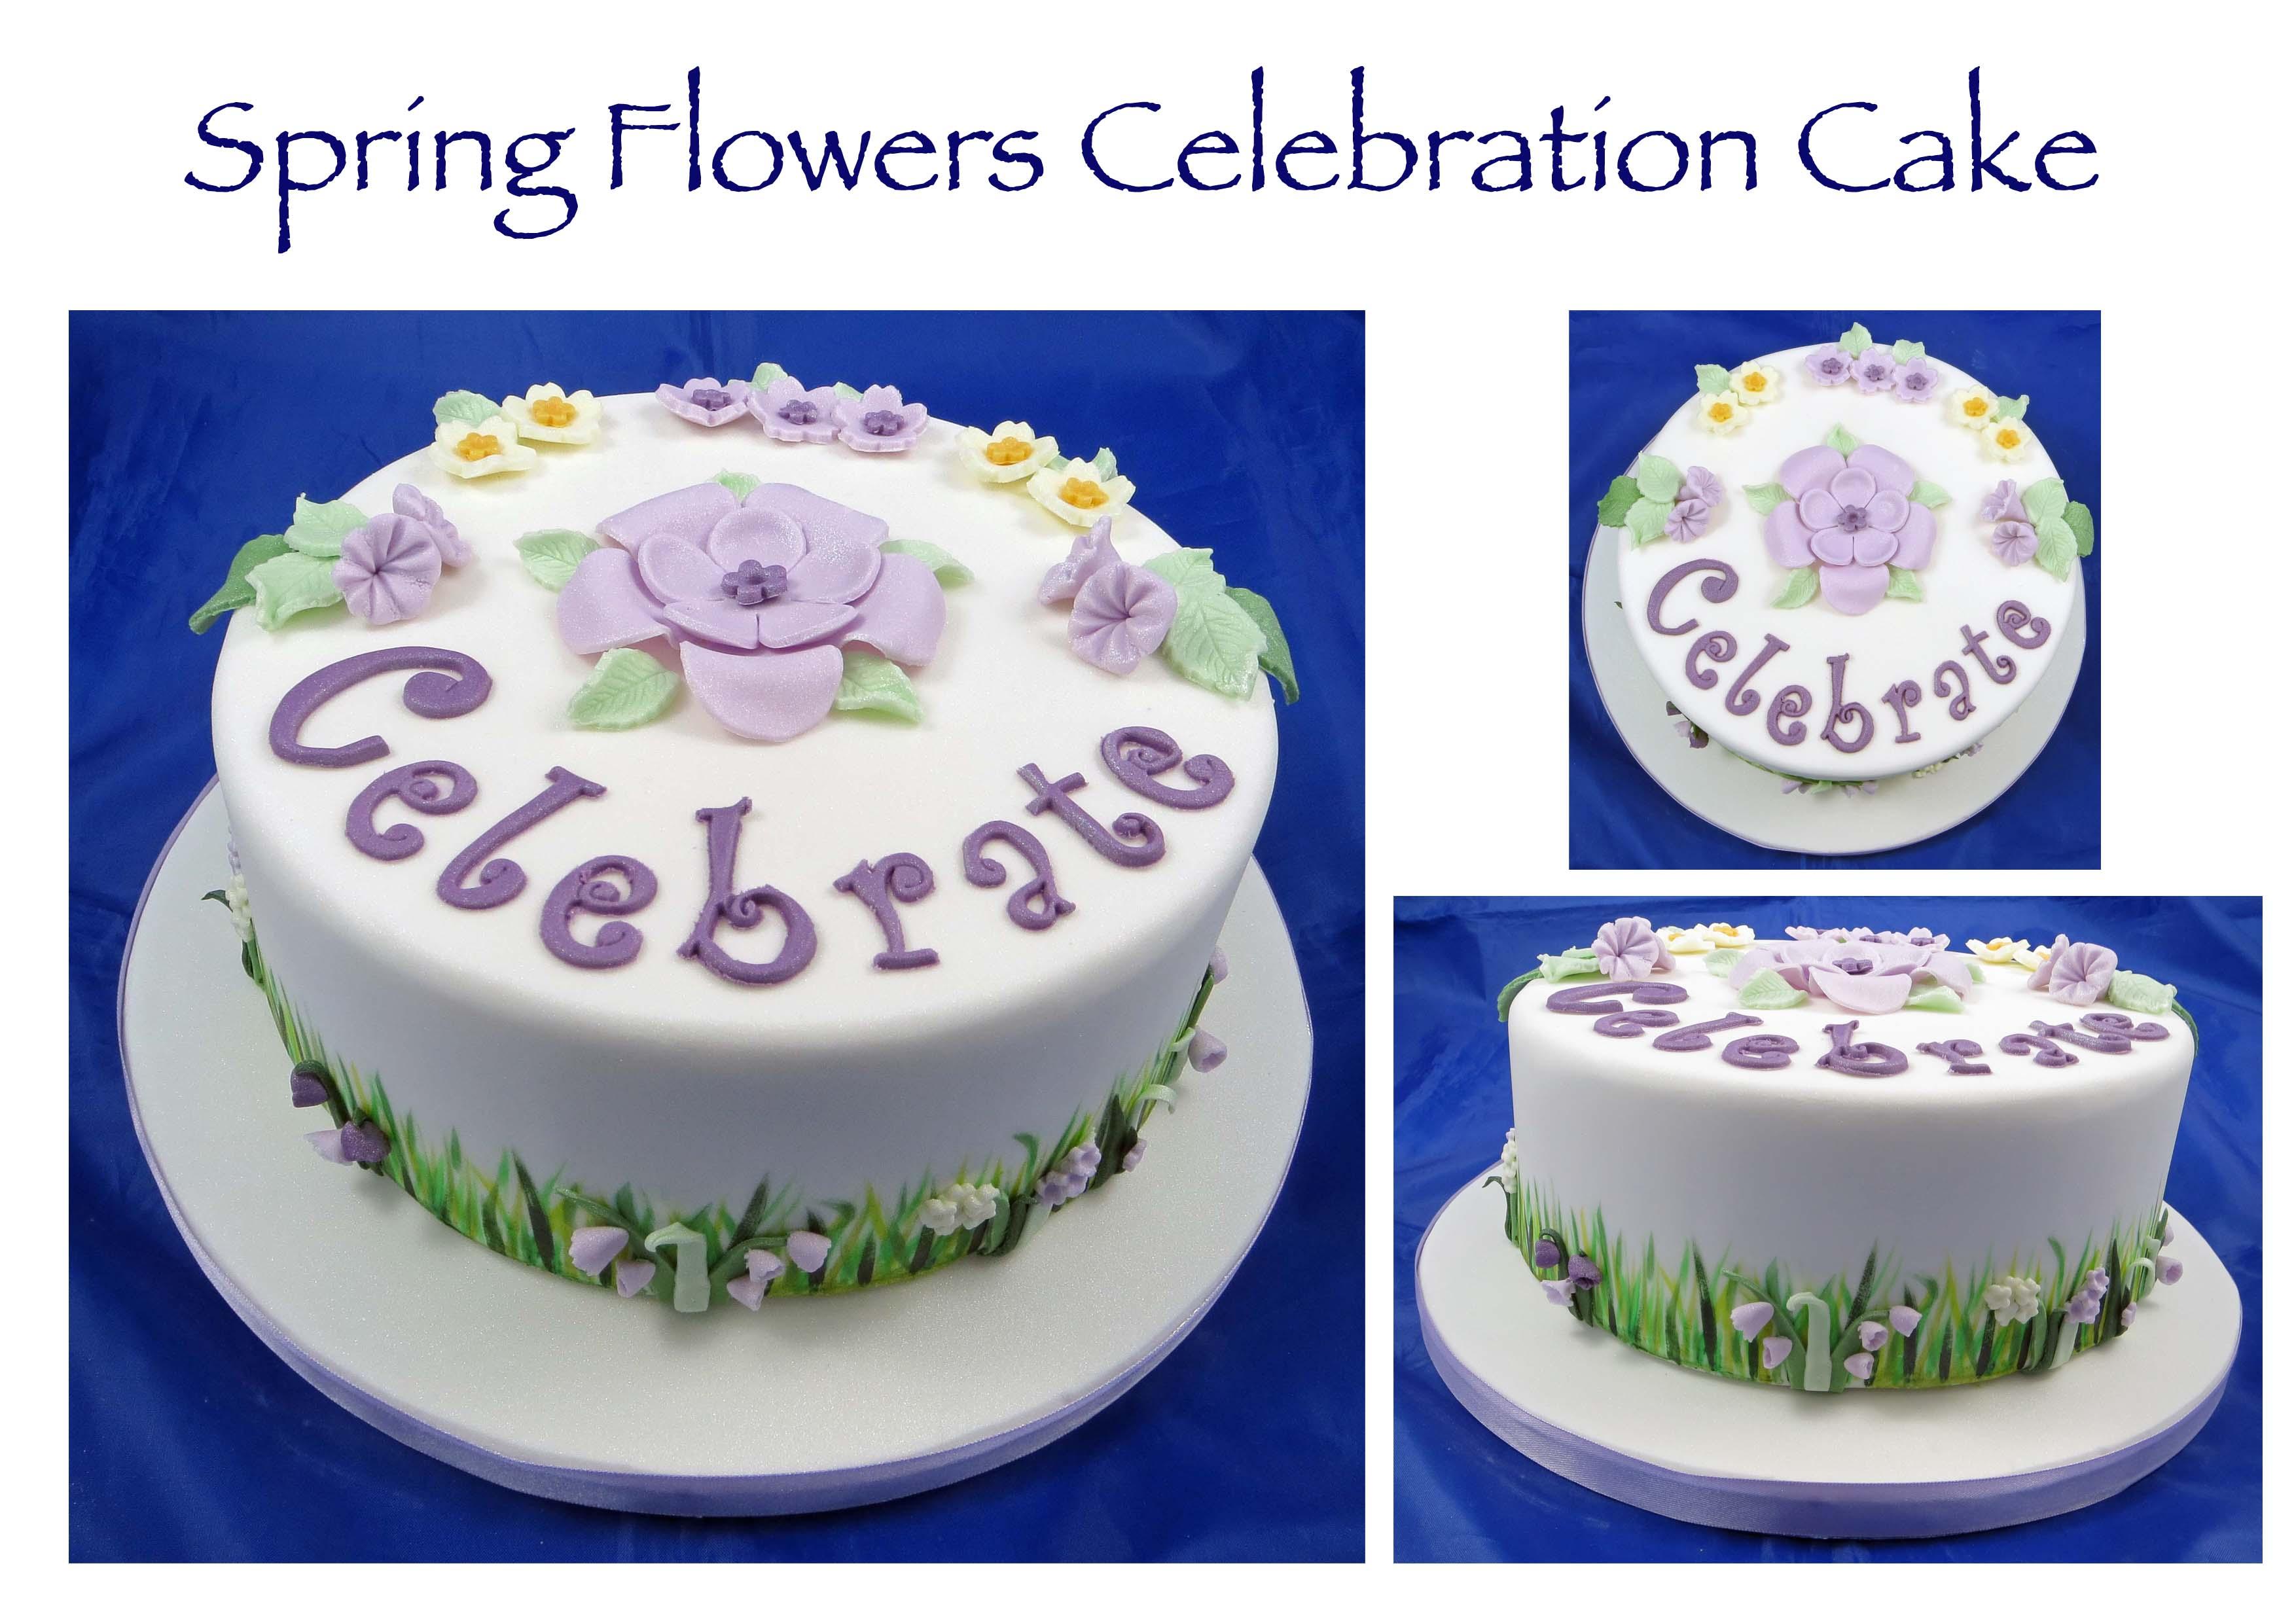 Spring Flowers Celebration Cake